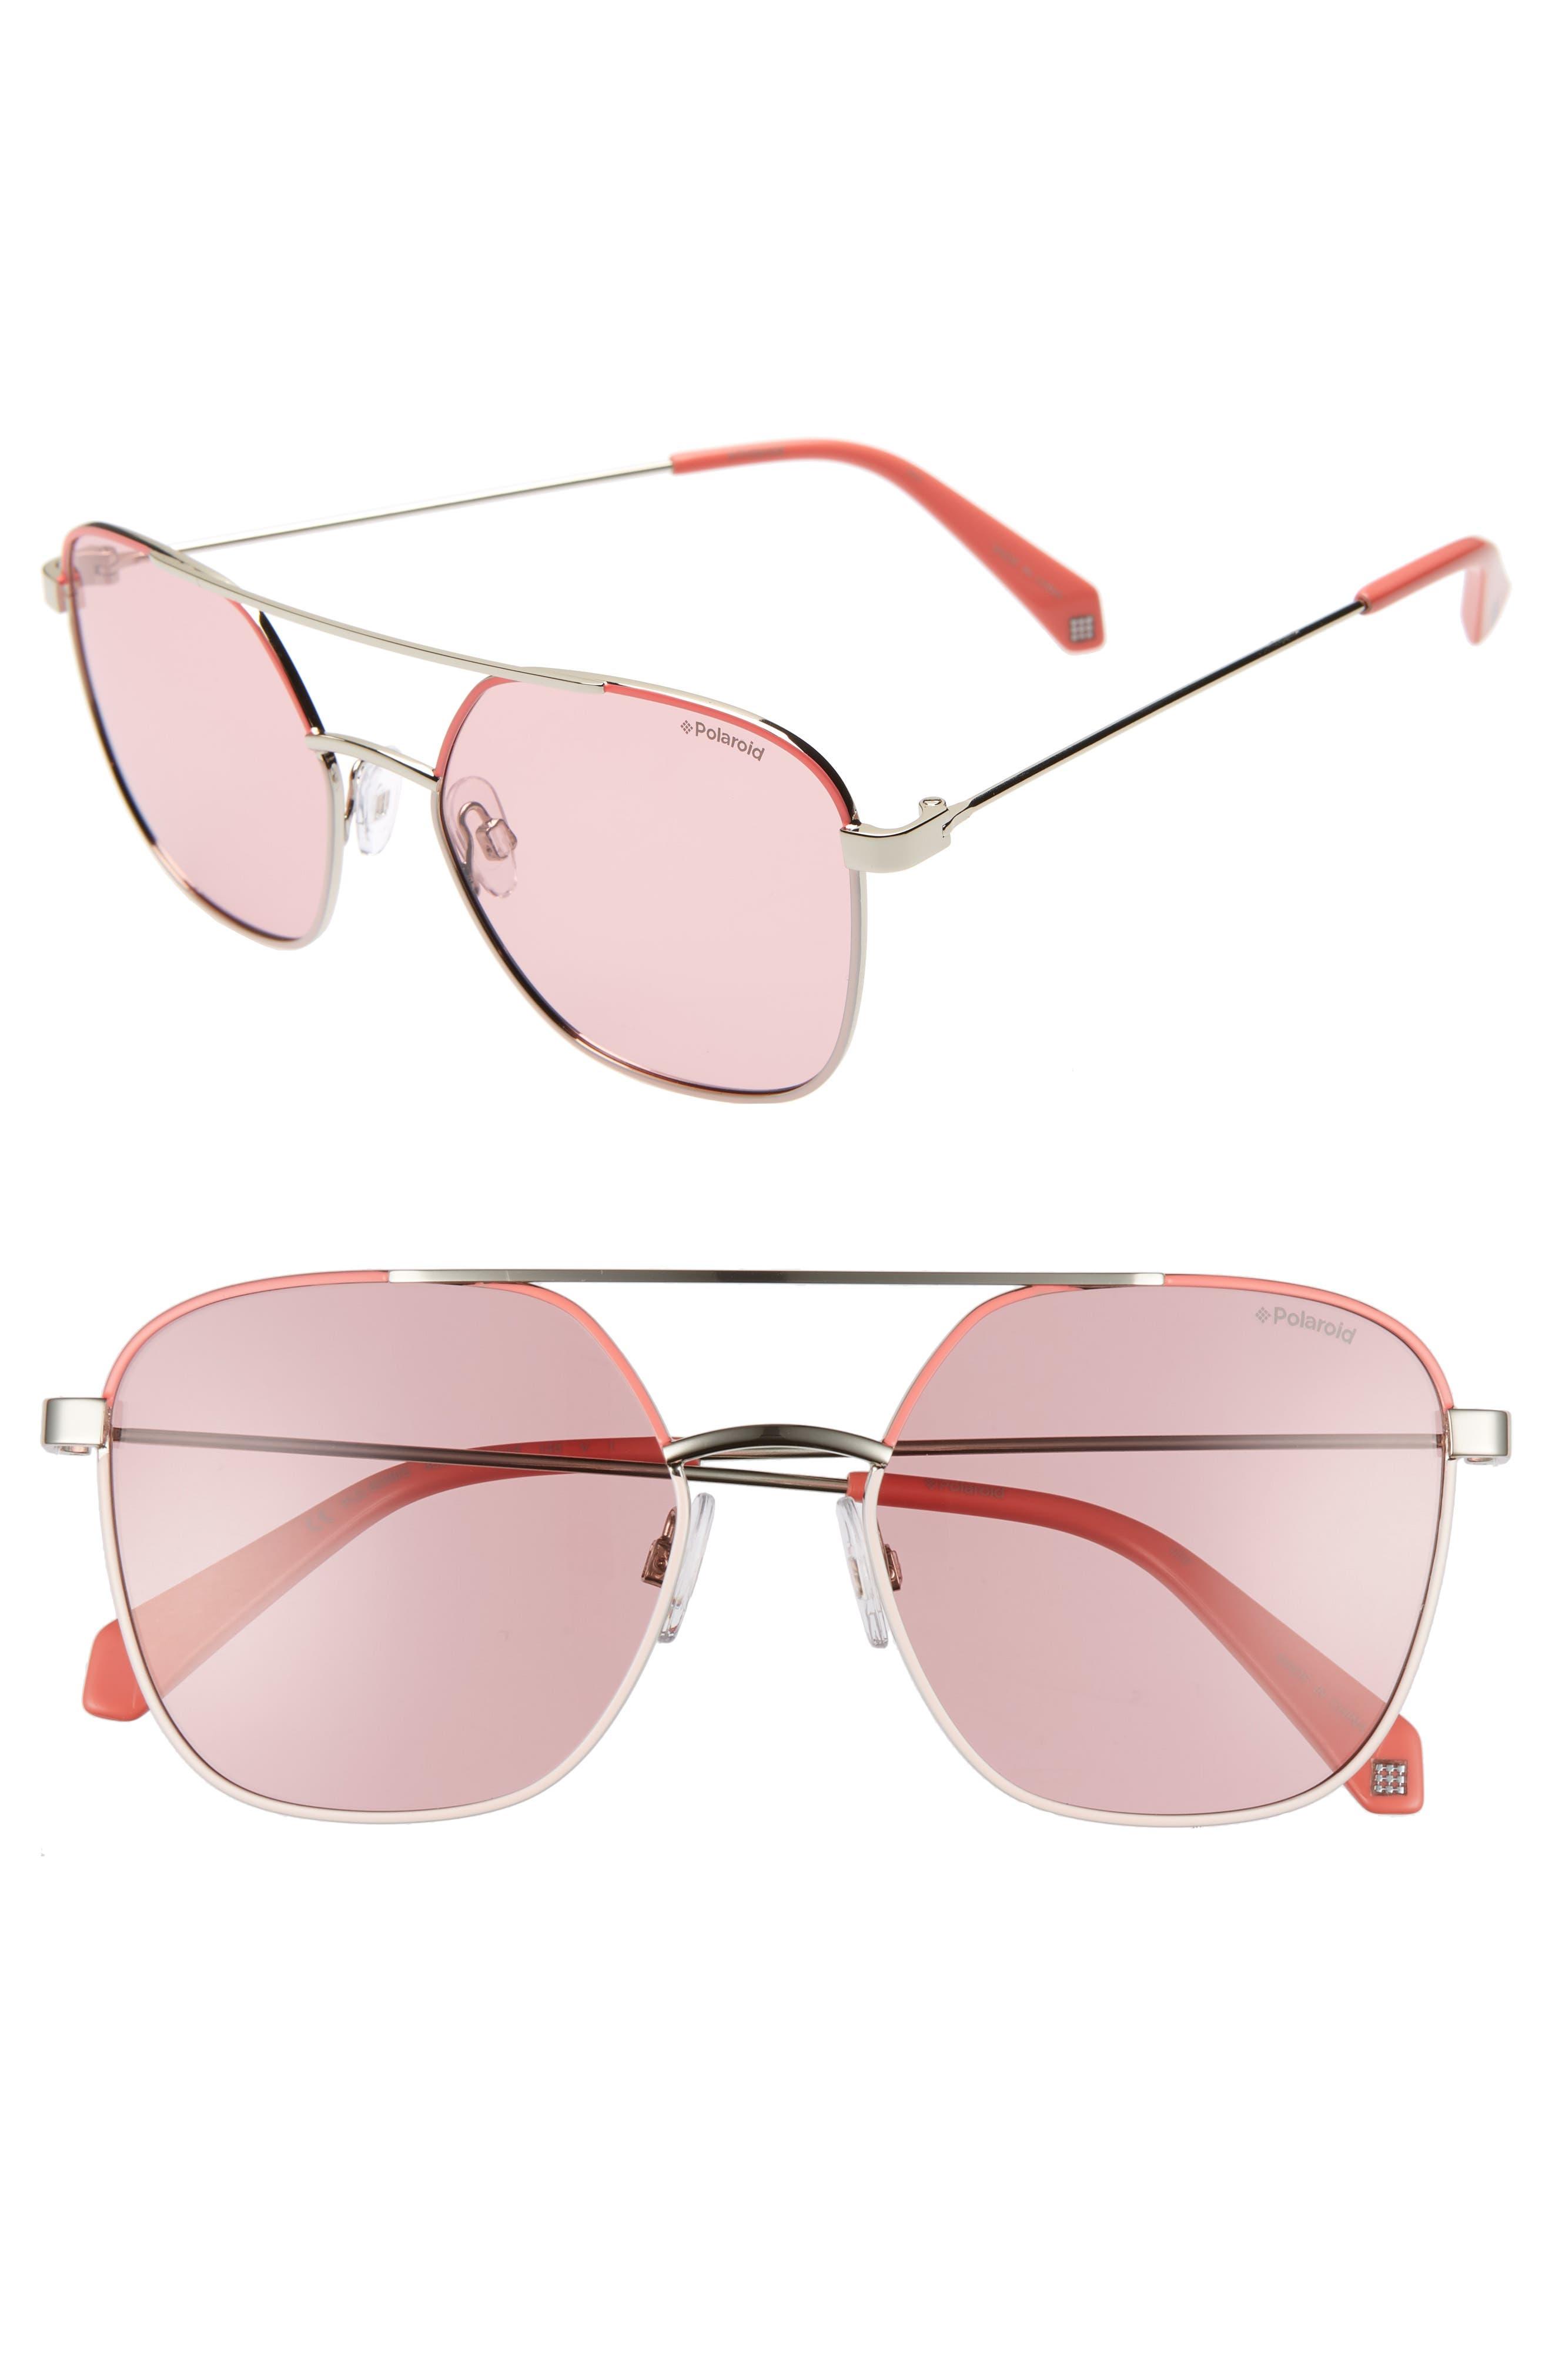 Polaroid 5m Polarized Square Aviator Sunglasses - Pink/ Silver